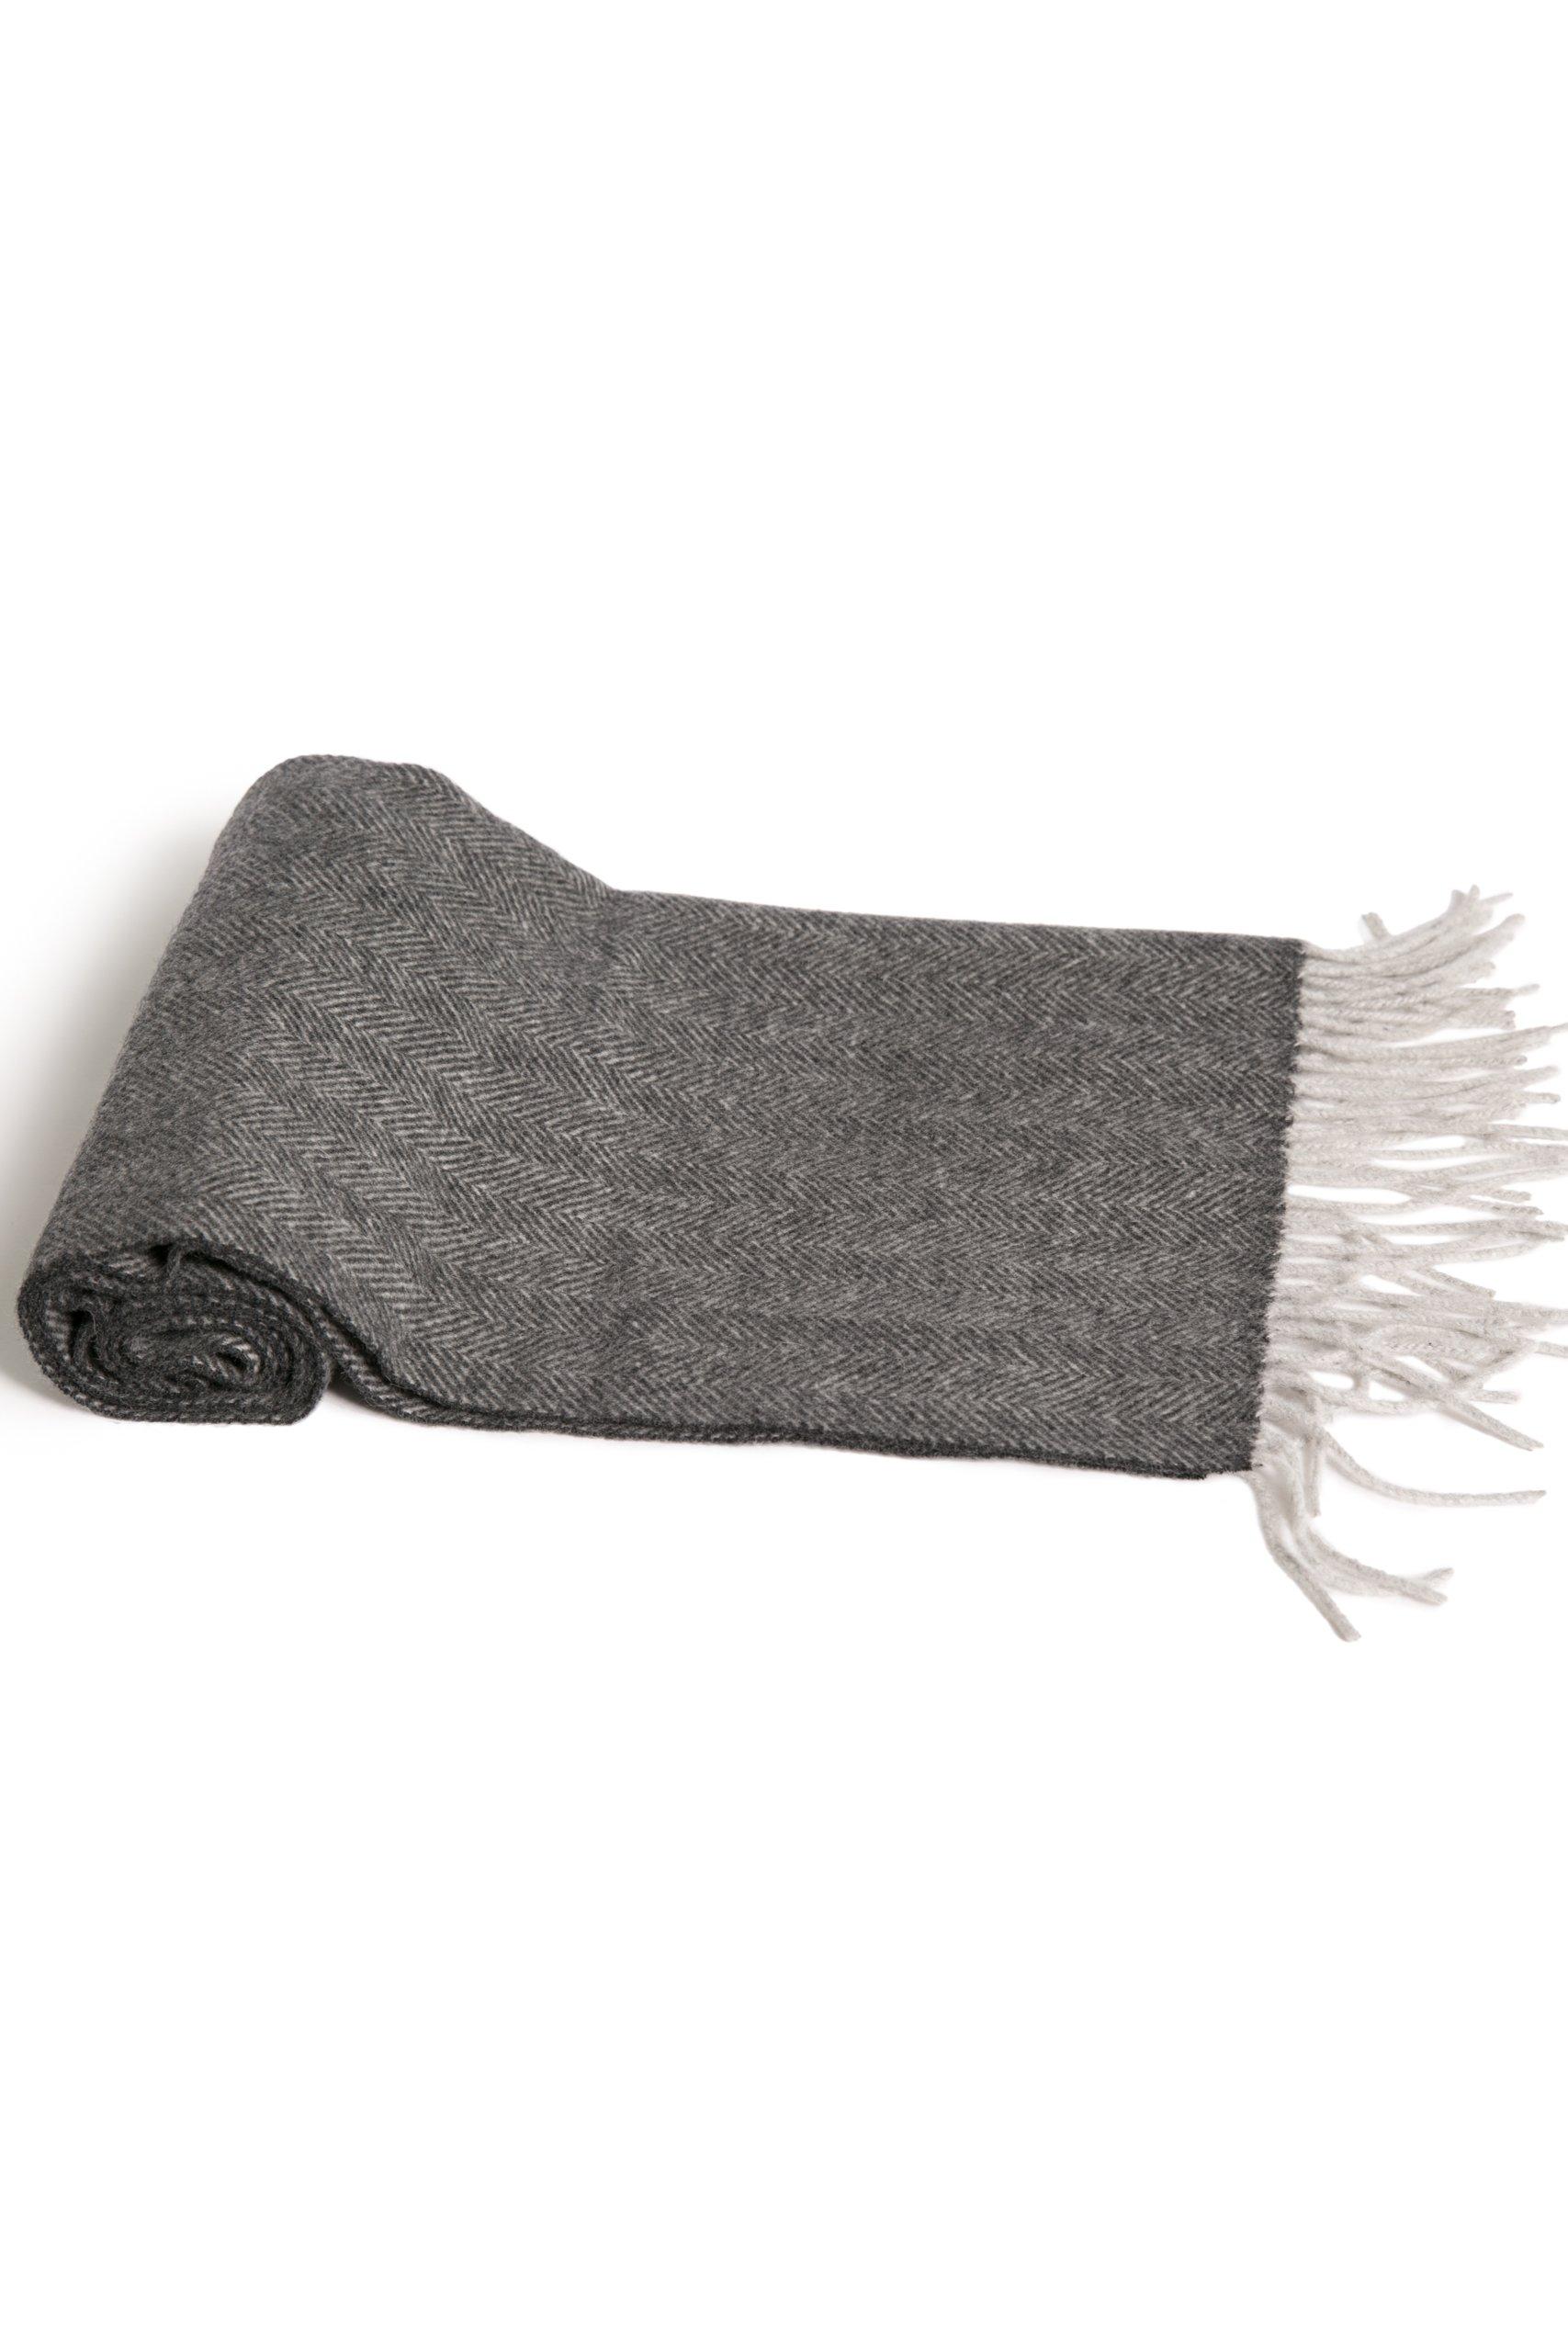 Fishers Finery Men's 100% Pure Cashmere Scarf; Super Soft and Warm (Herringbone)